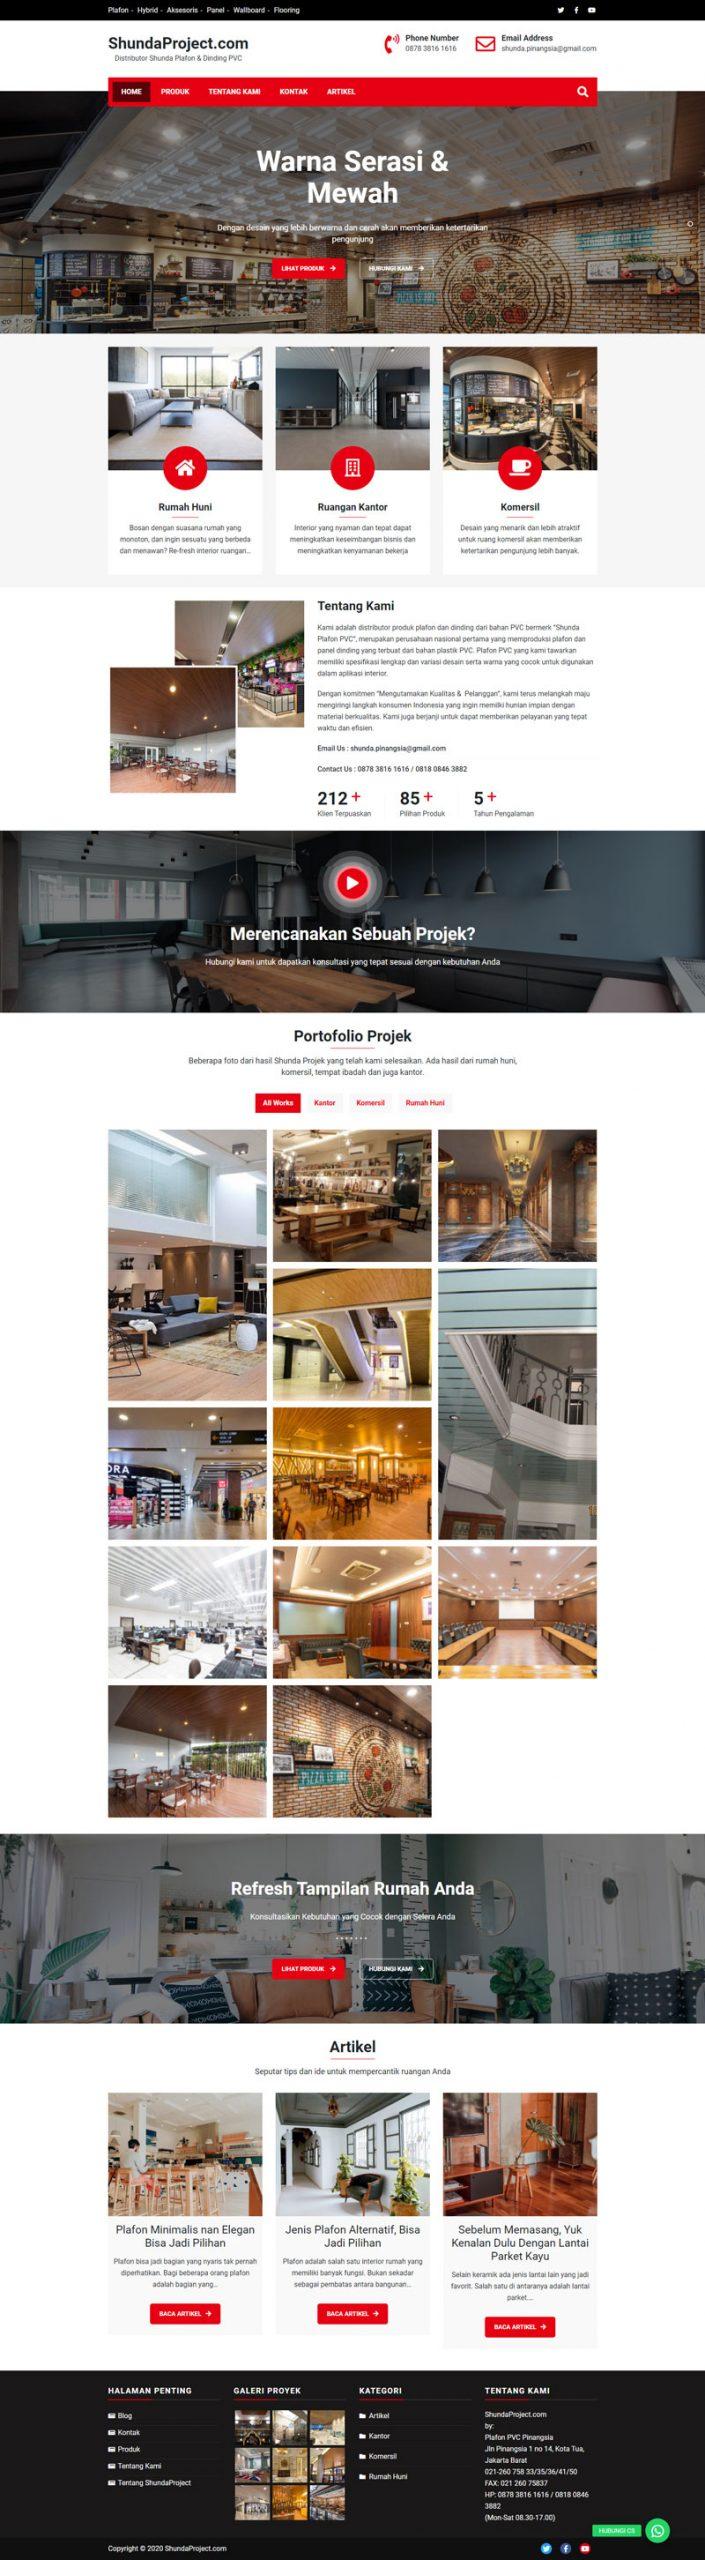 ShundaProject.com homepage preview full 1 halaman